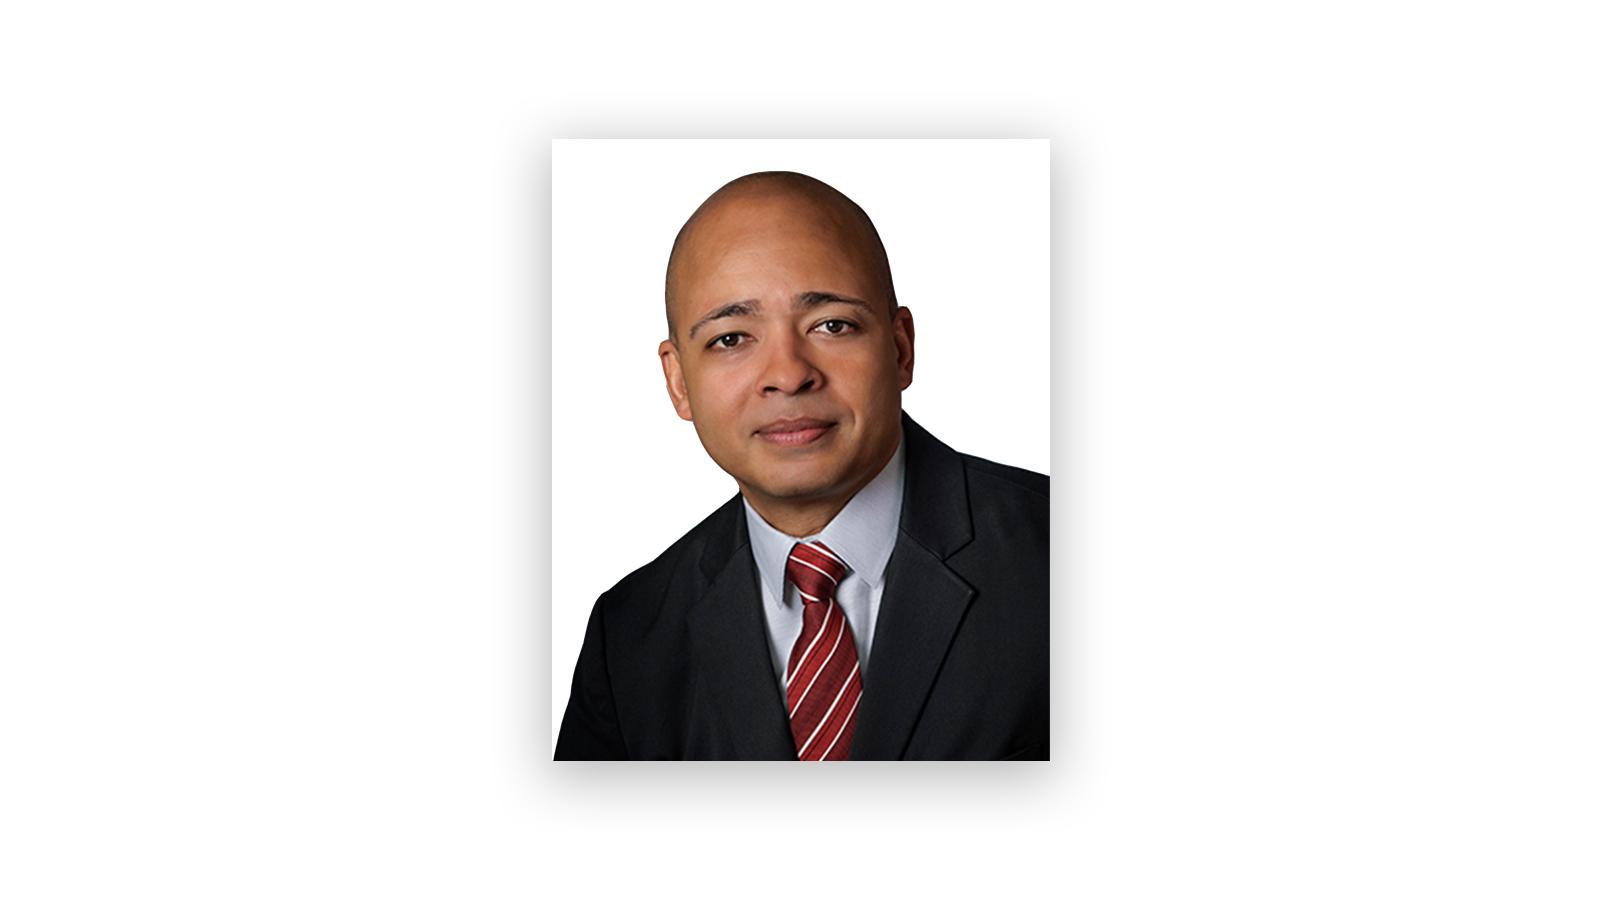 Jason Gumbs, Regional SVP for Company's Big South Region